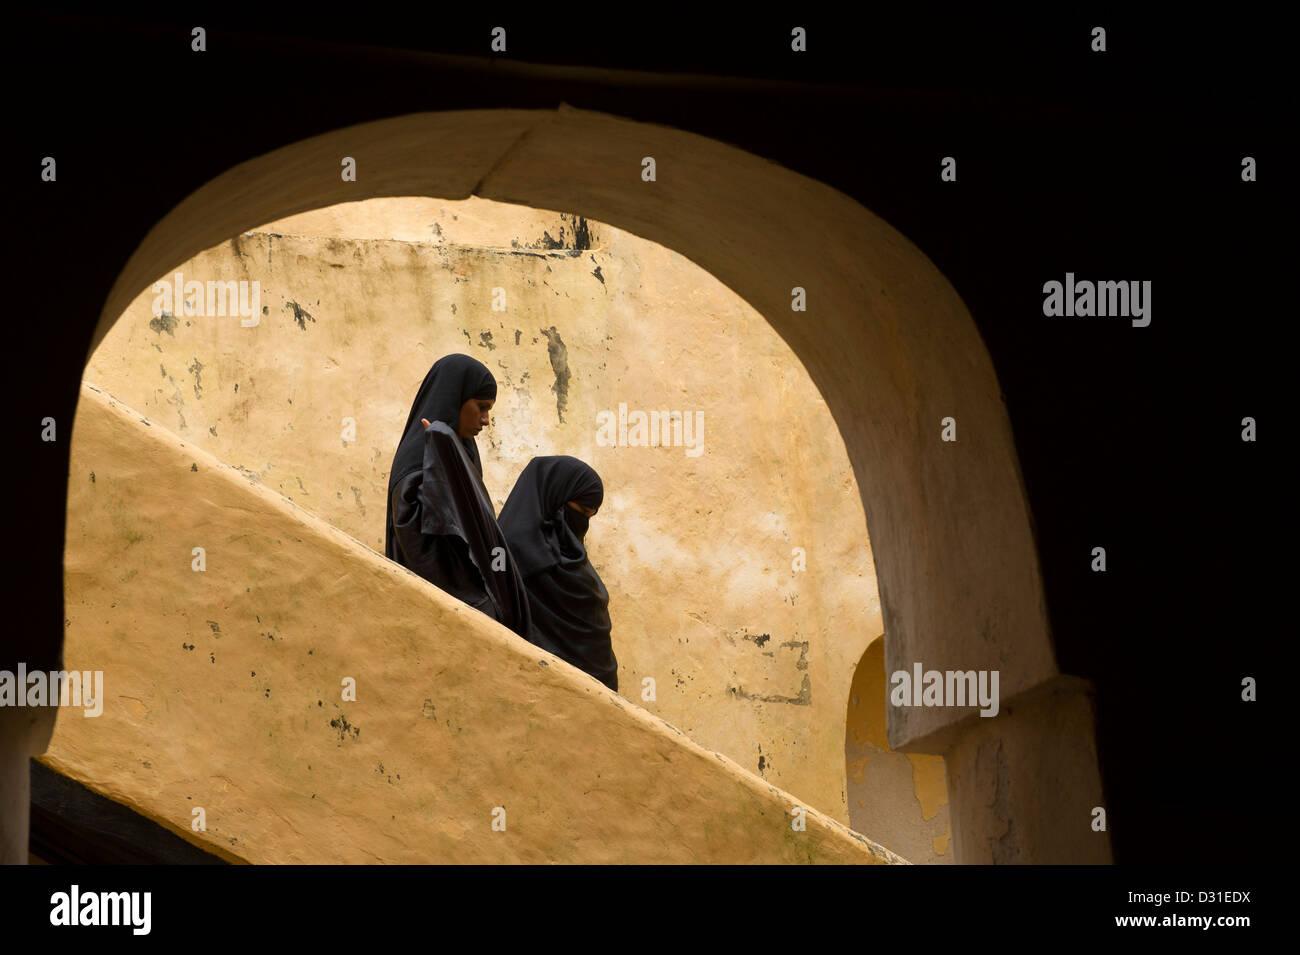 Muslim women in the old fort, Lamu, Lamu Archipelago, Kenya - Stock Image